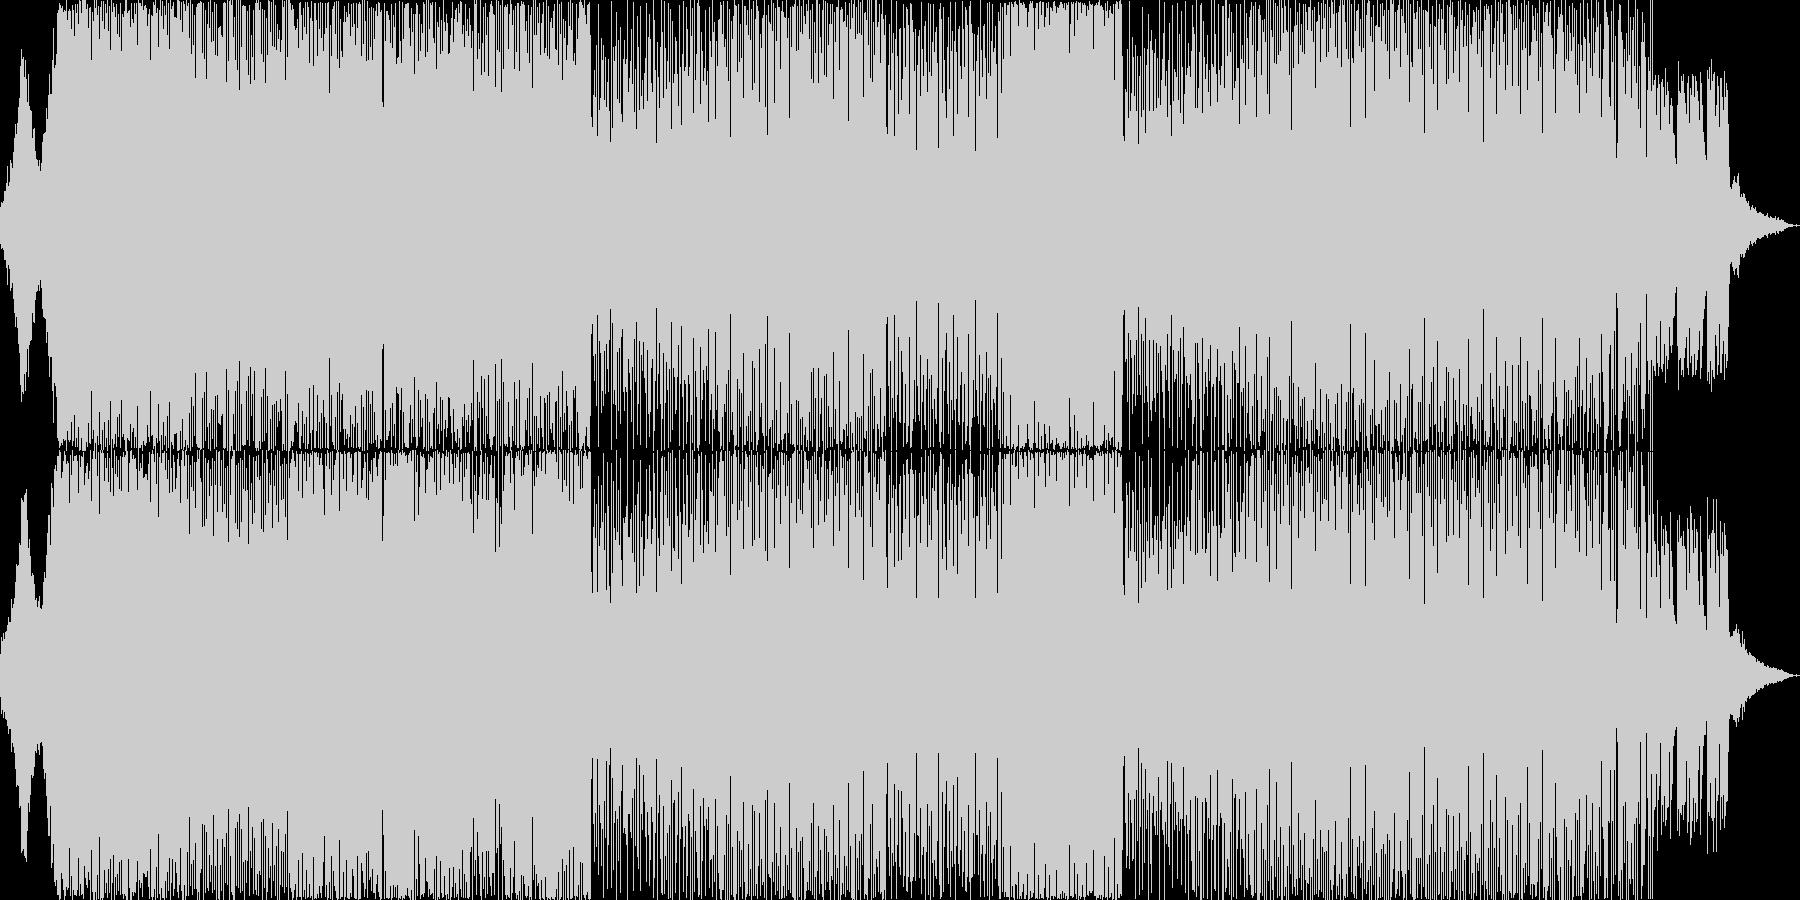 EDM テクノ ネオン クラブサウンドの未再生の波形